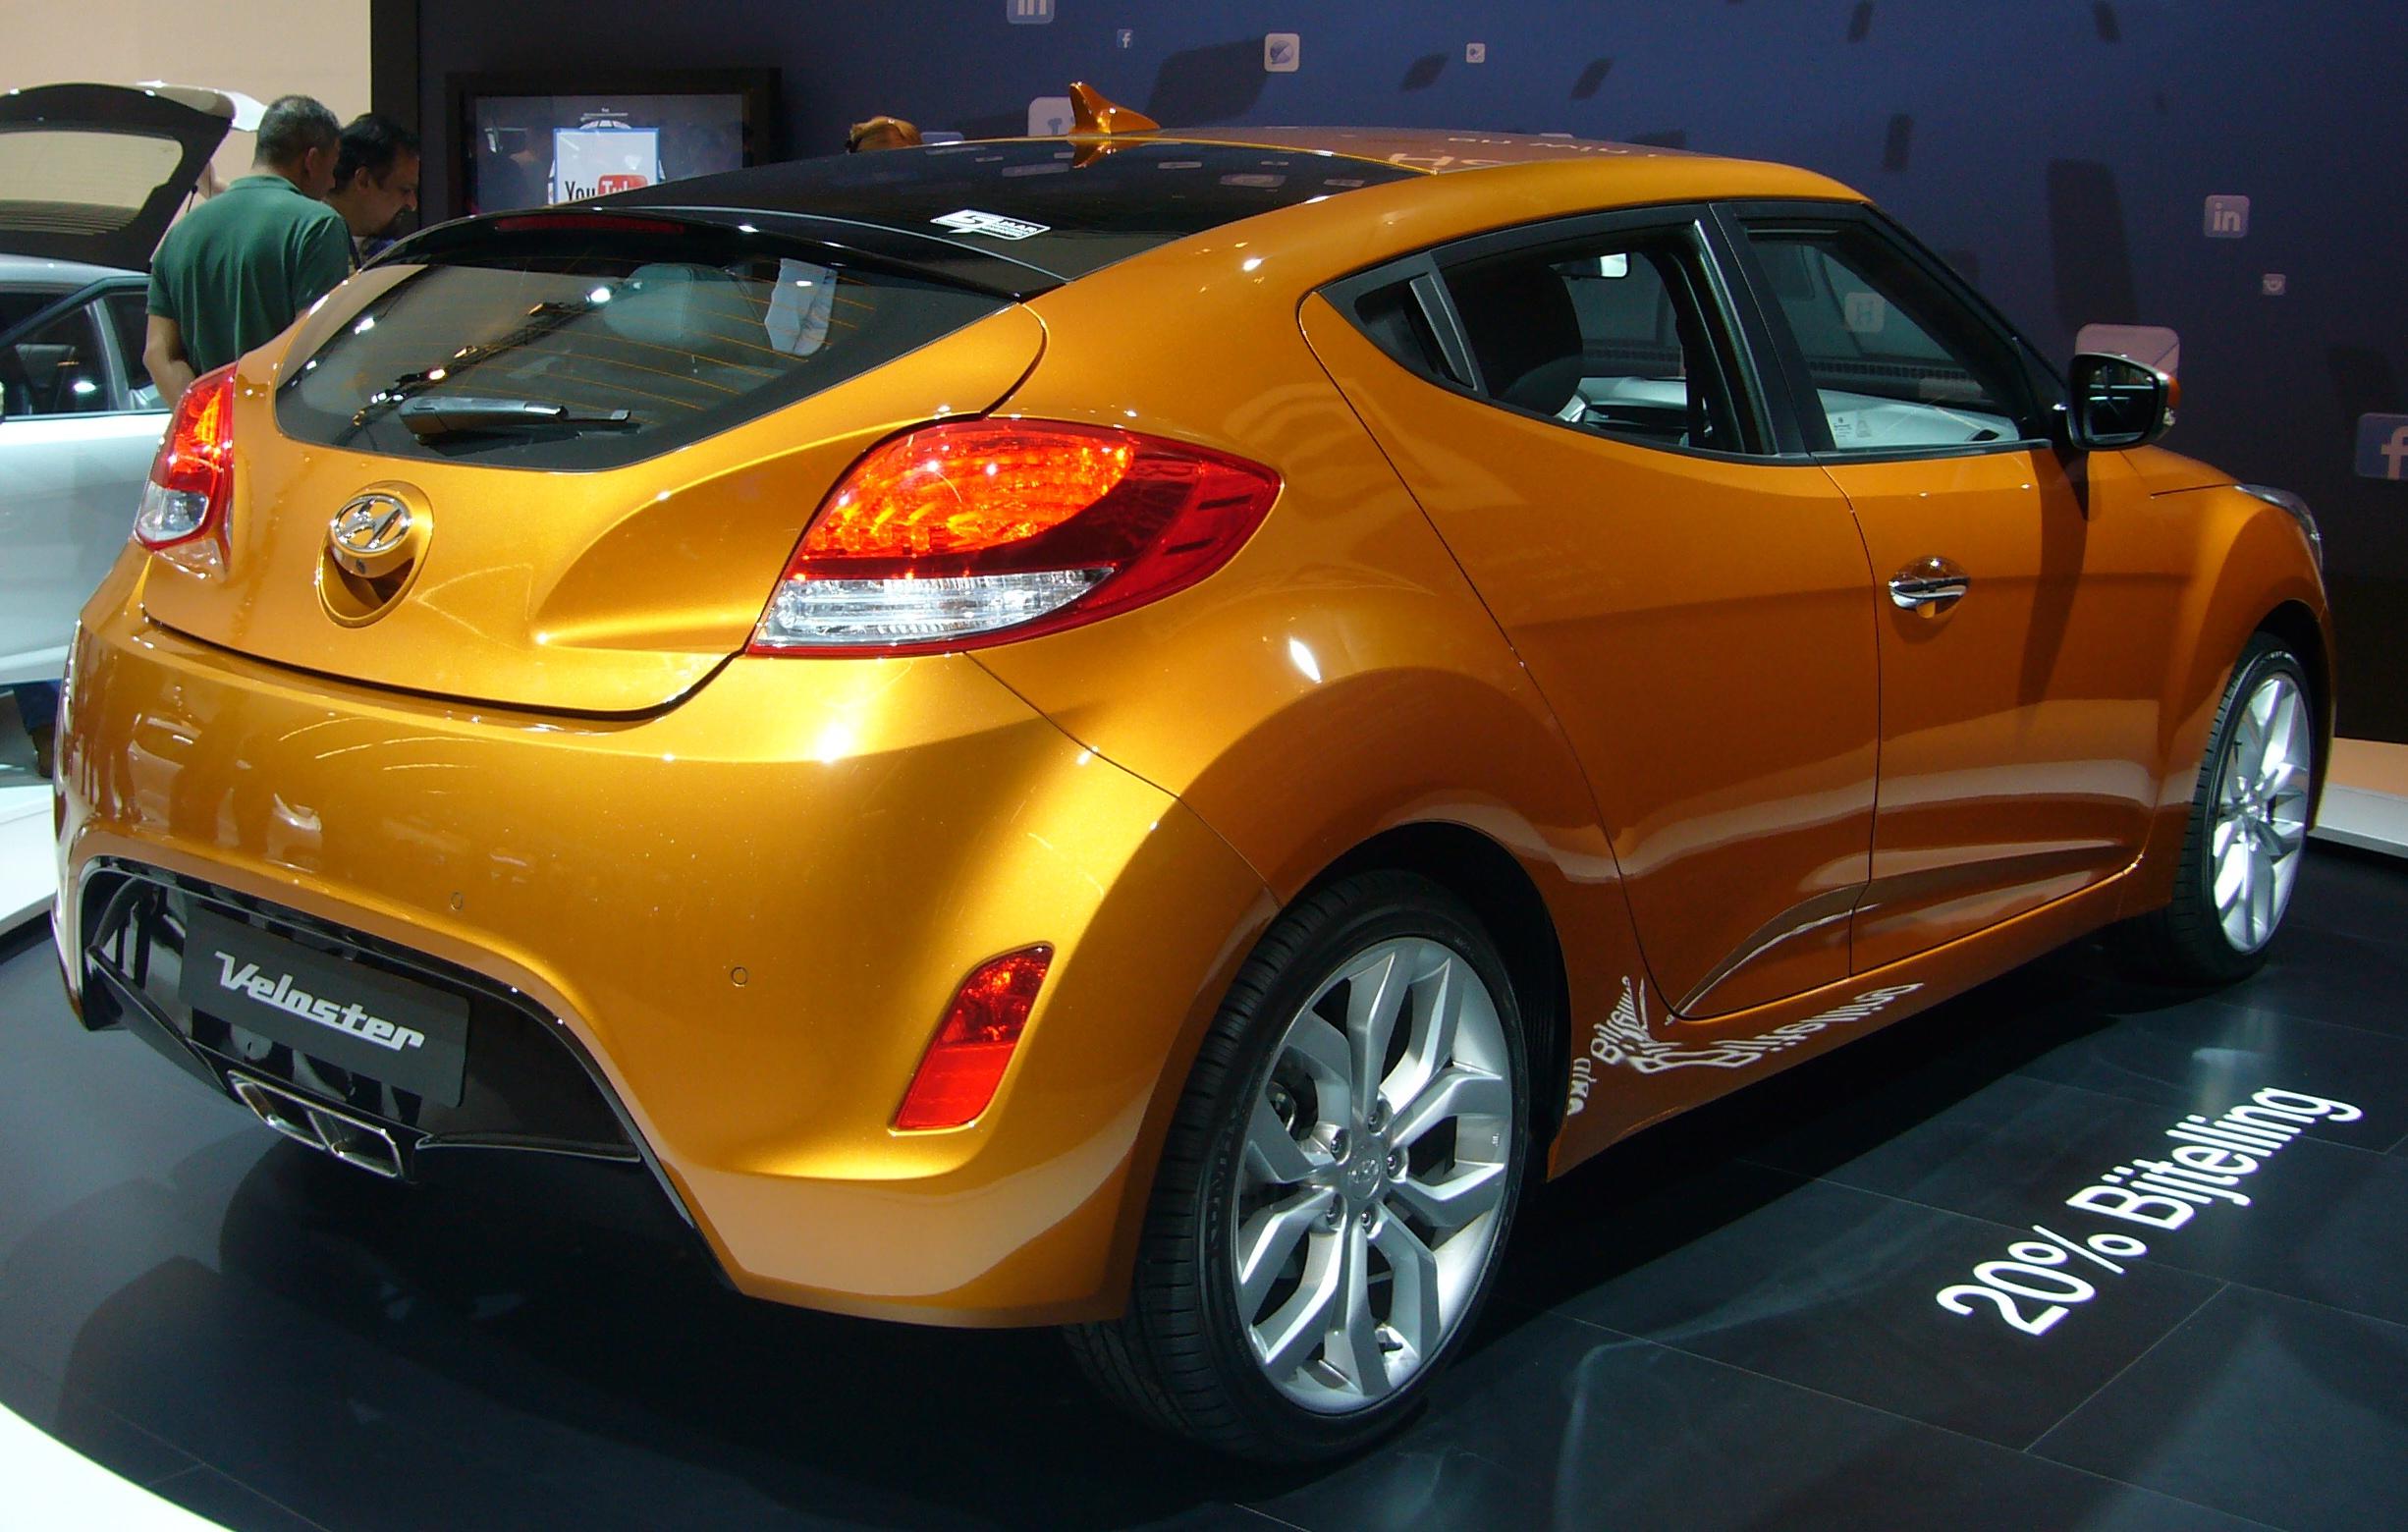 File:Hyundai Veloster (right rear quarter).jpg - Wikimedia Commons